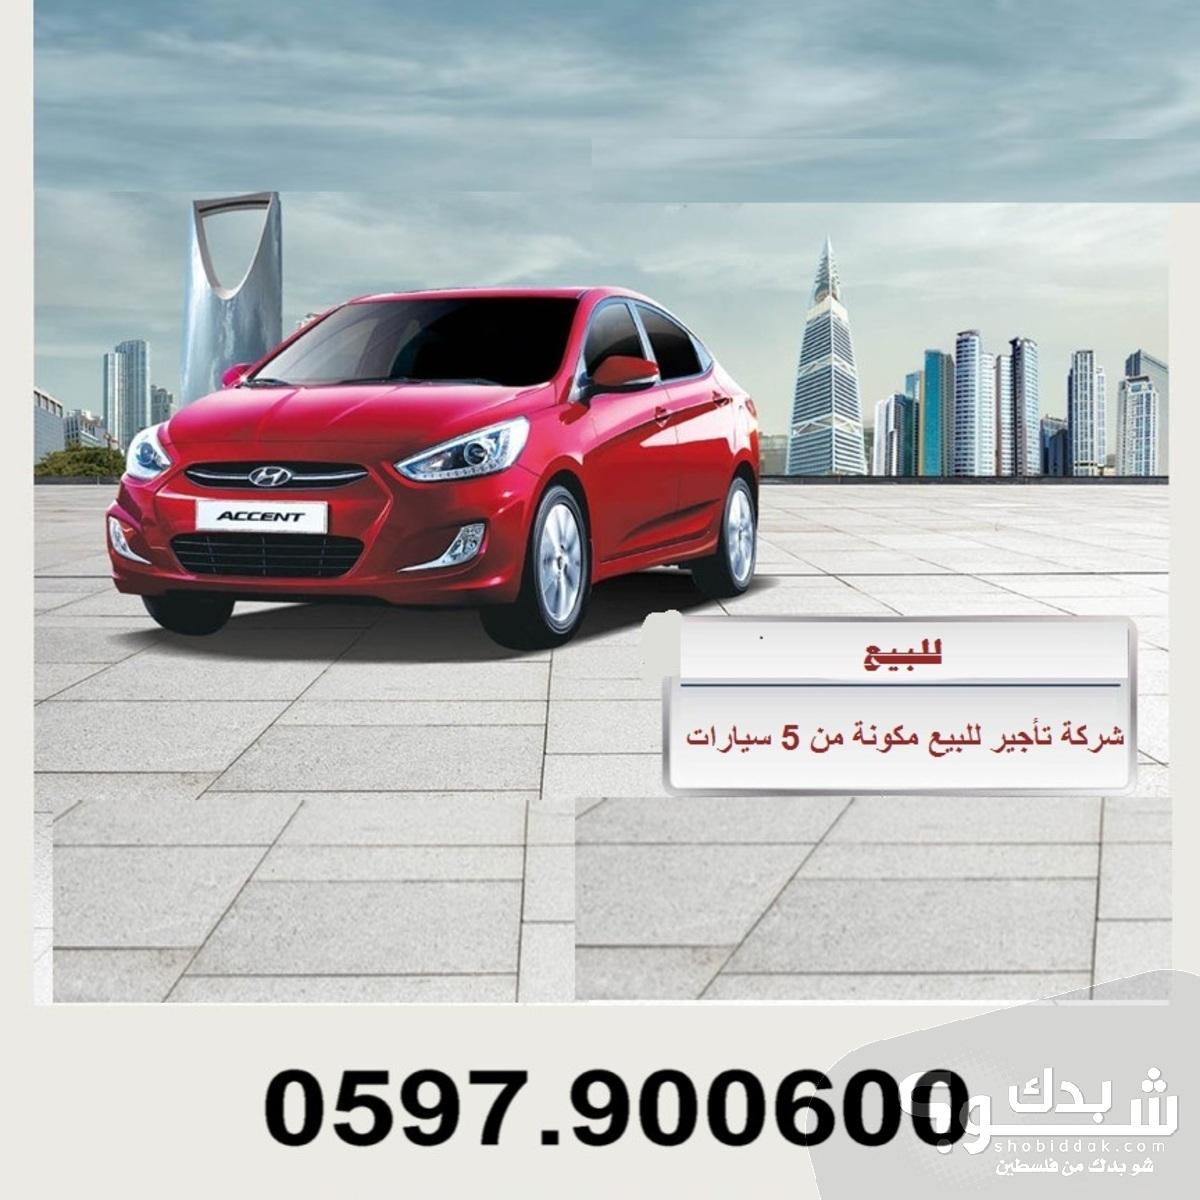 2291ce63e شركة تأجير سيارات للبيع برام الله الماصيون مكونة من 5 سيارات